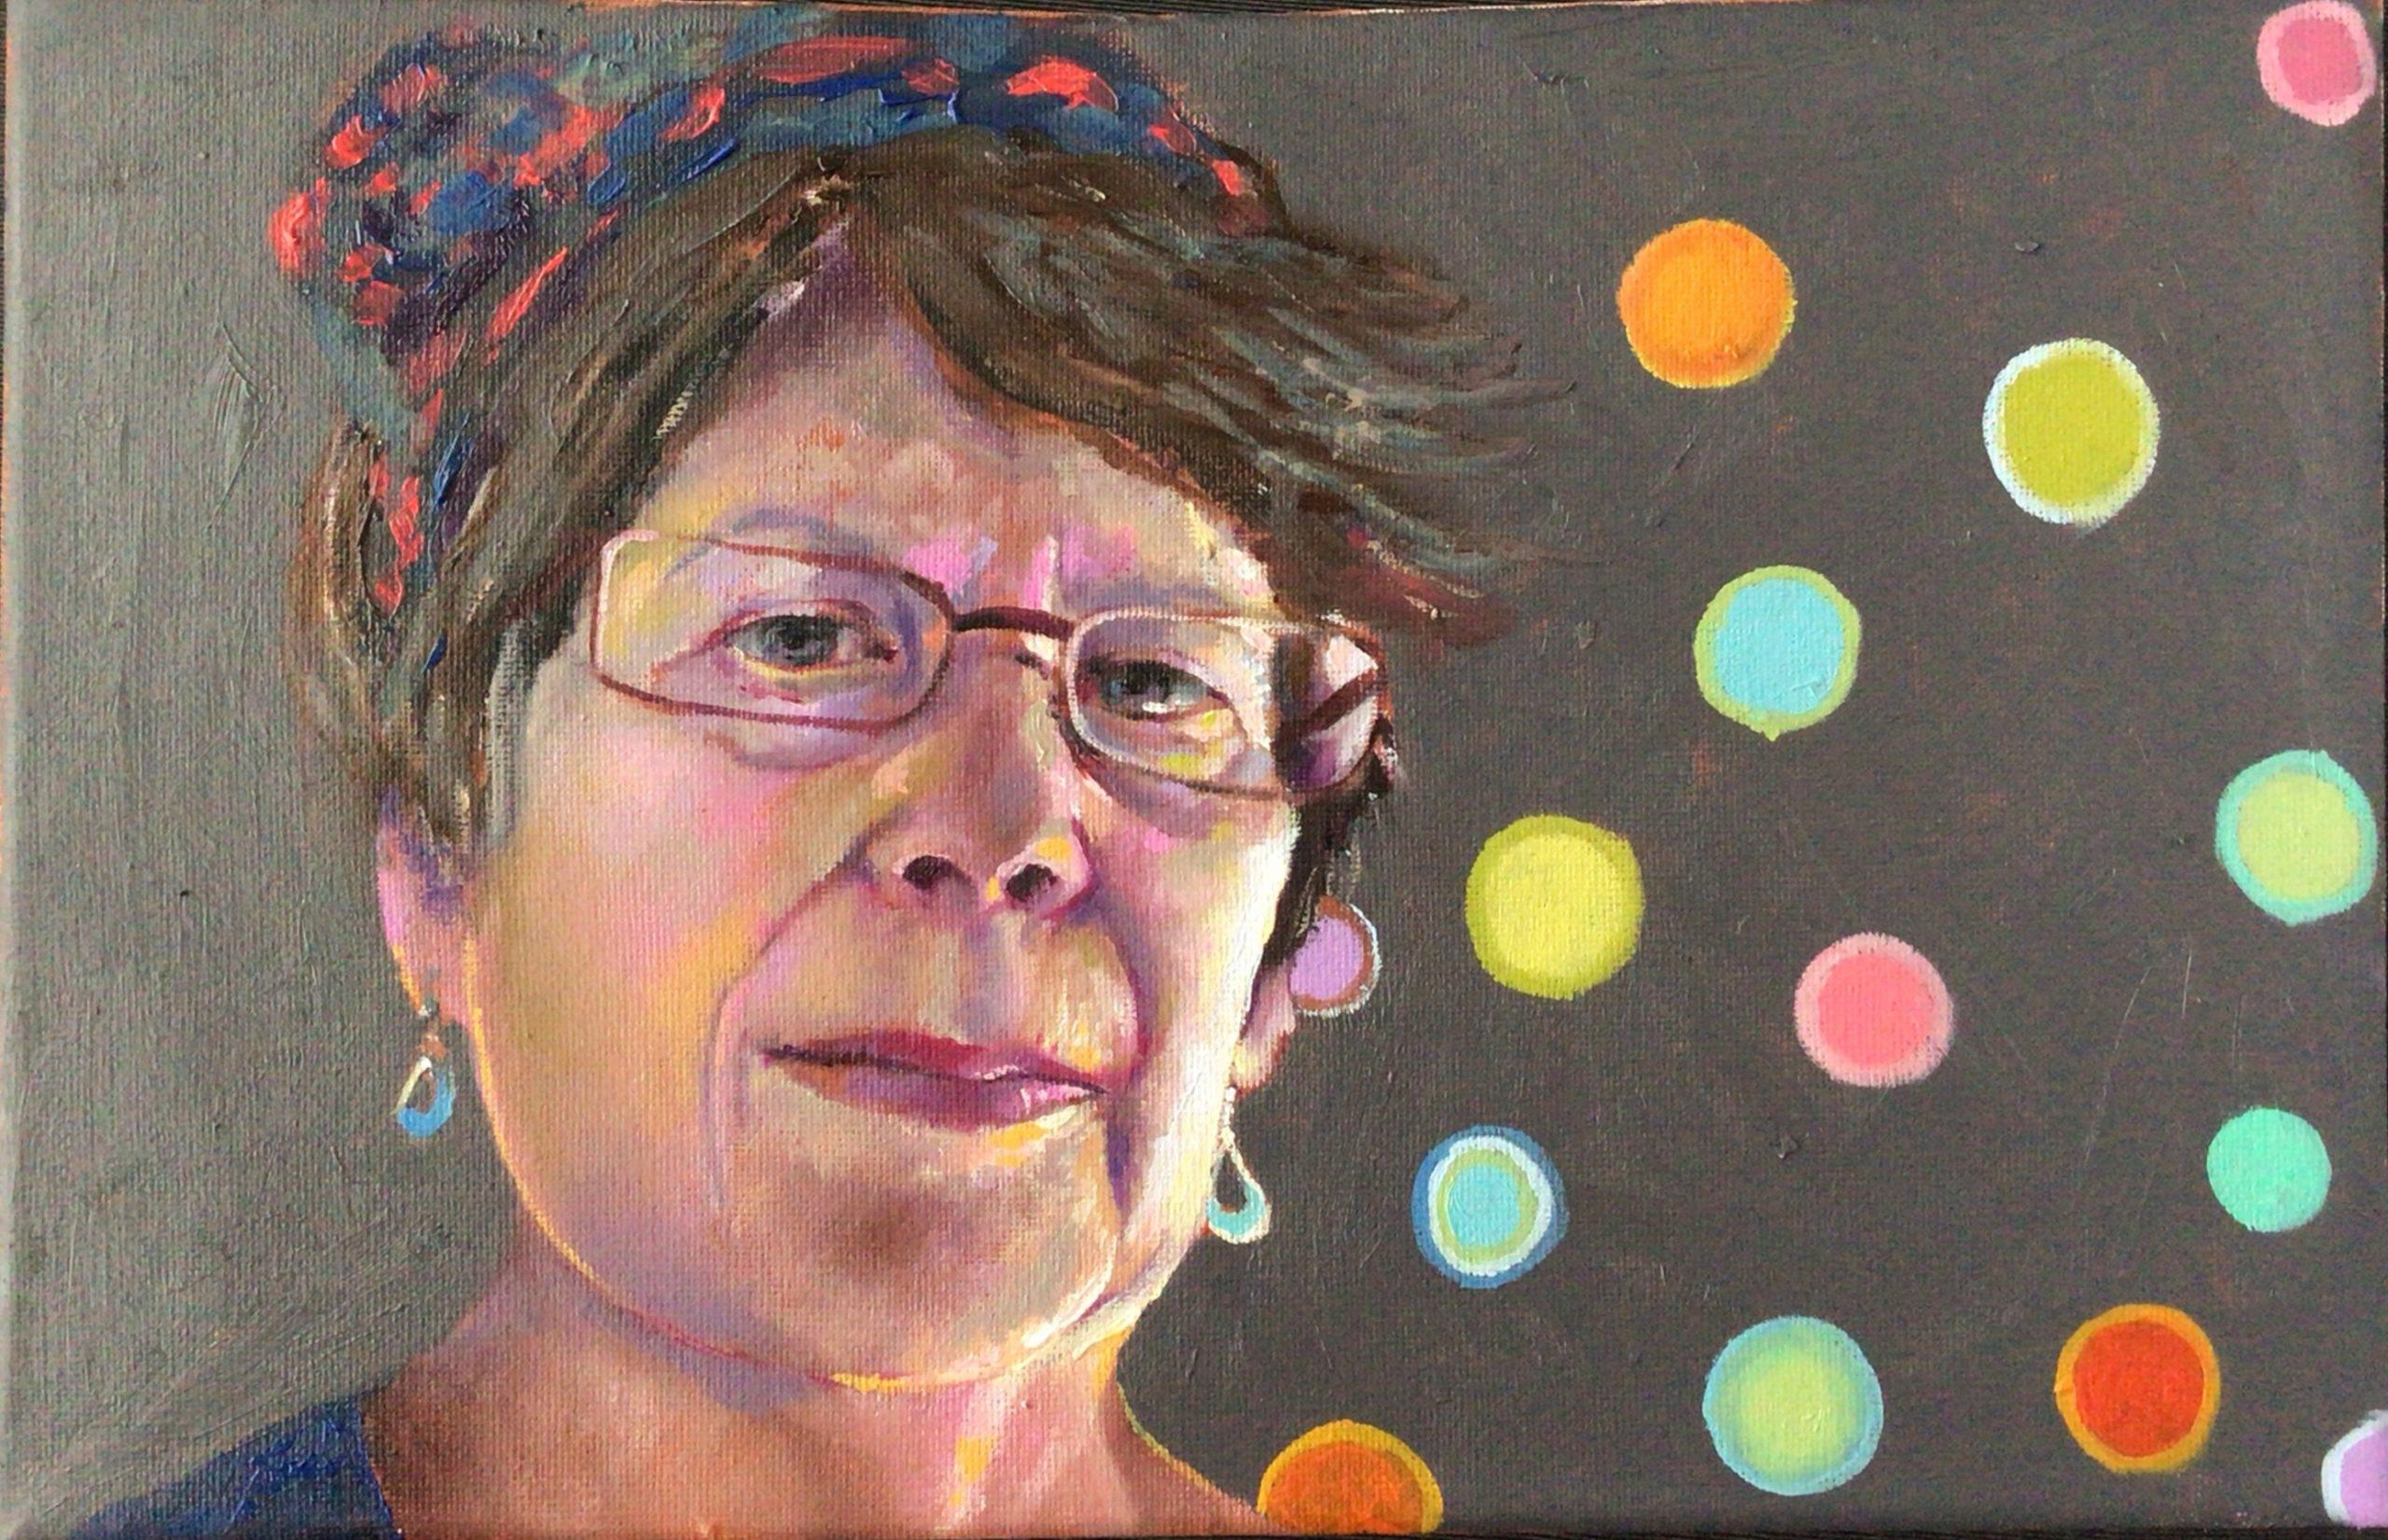 2-judith-beecher-self-portrait-oil-on-canvas-nfs-20-x-30-cms